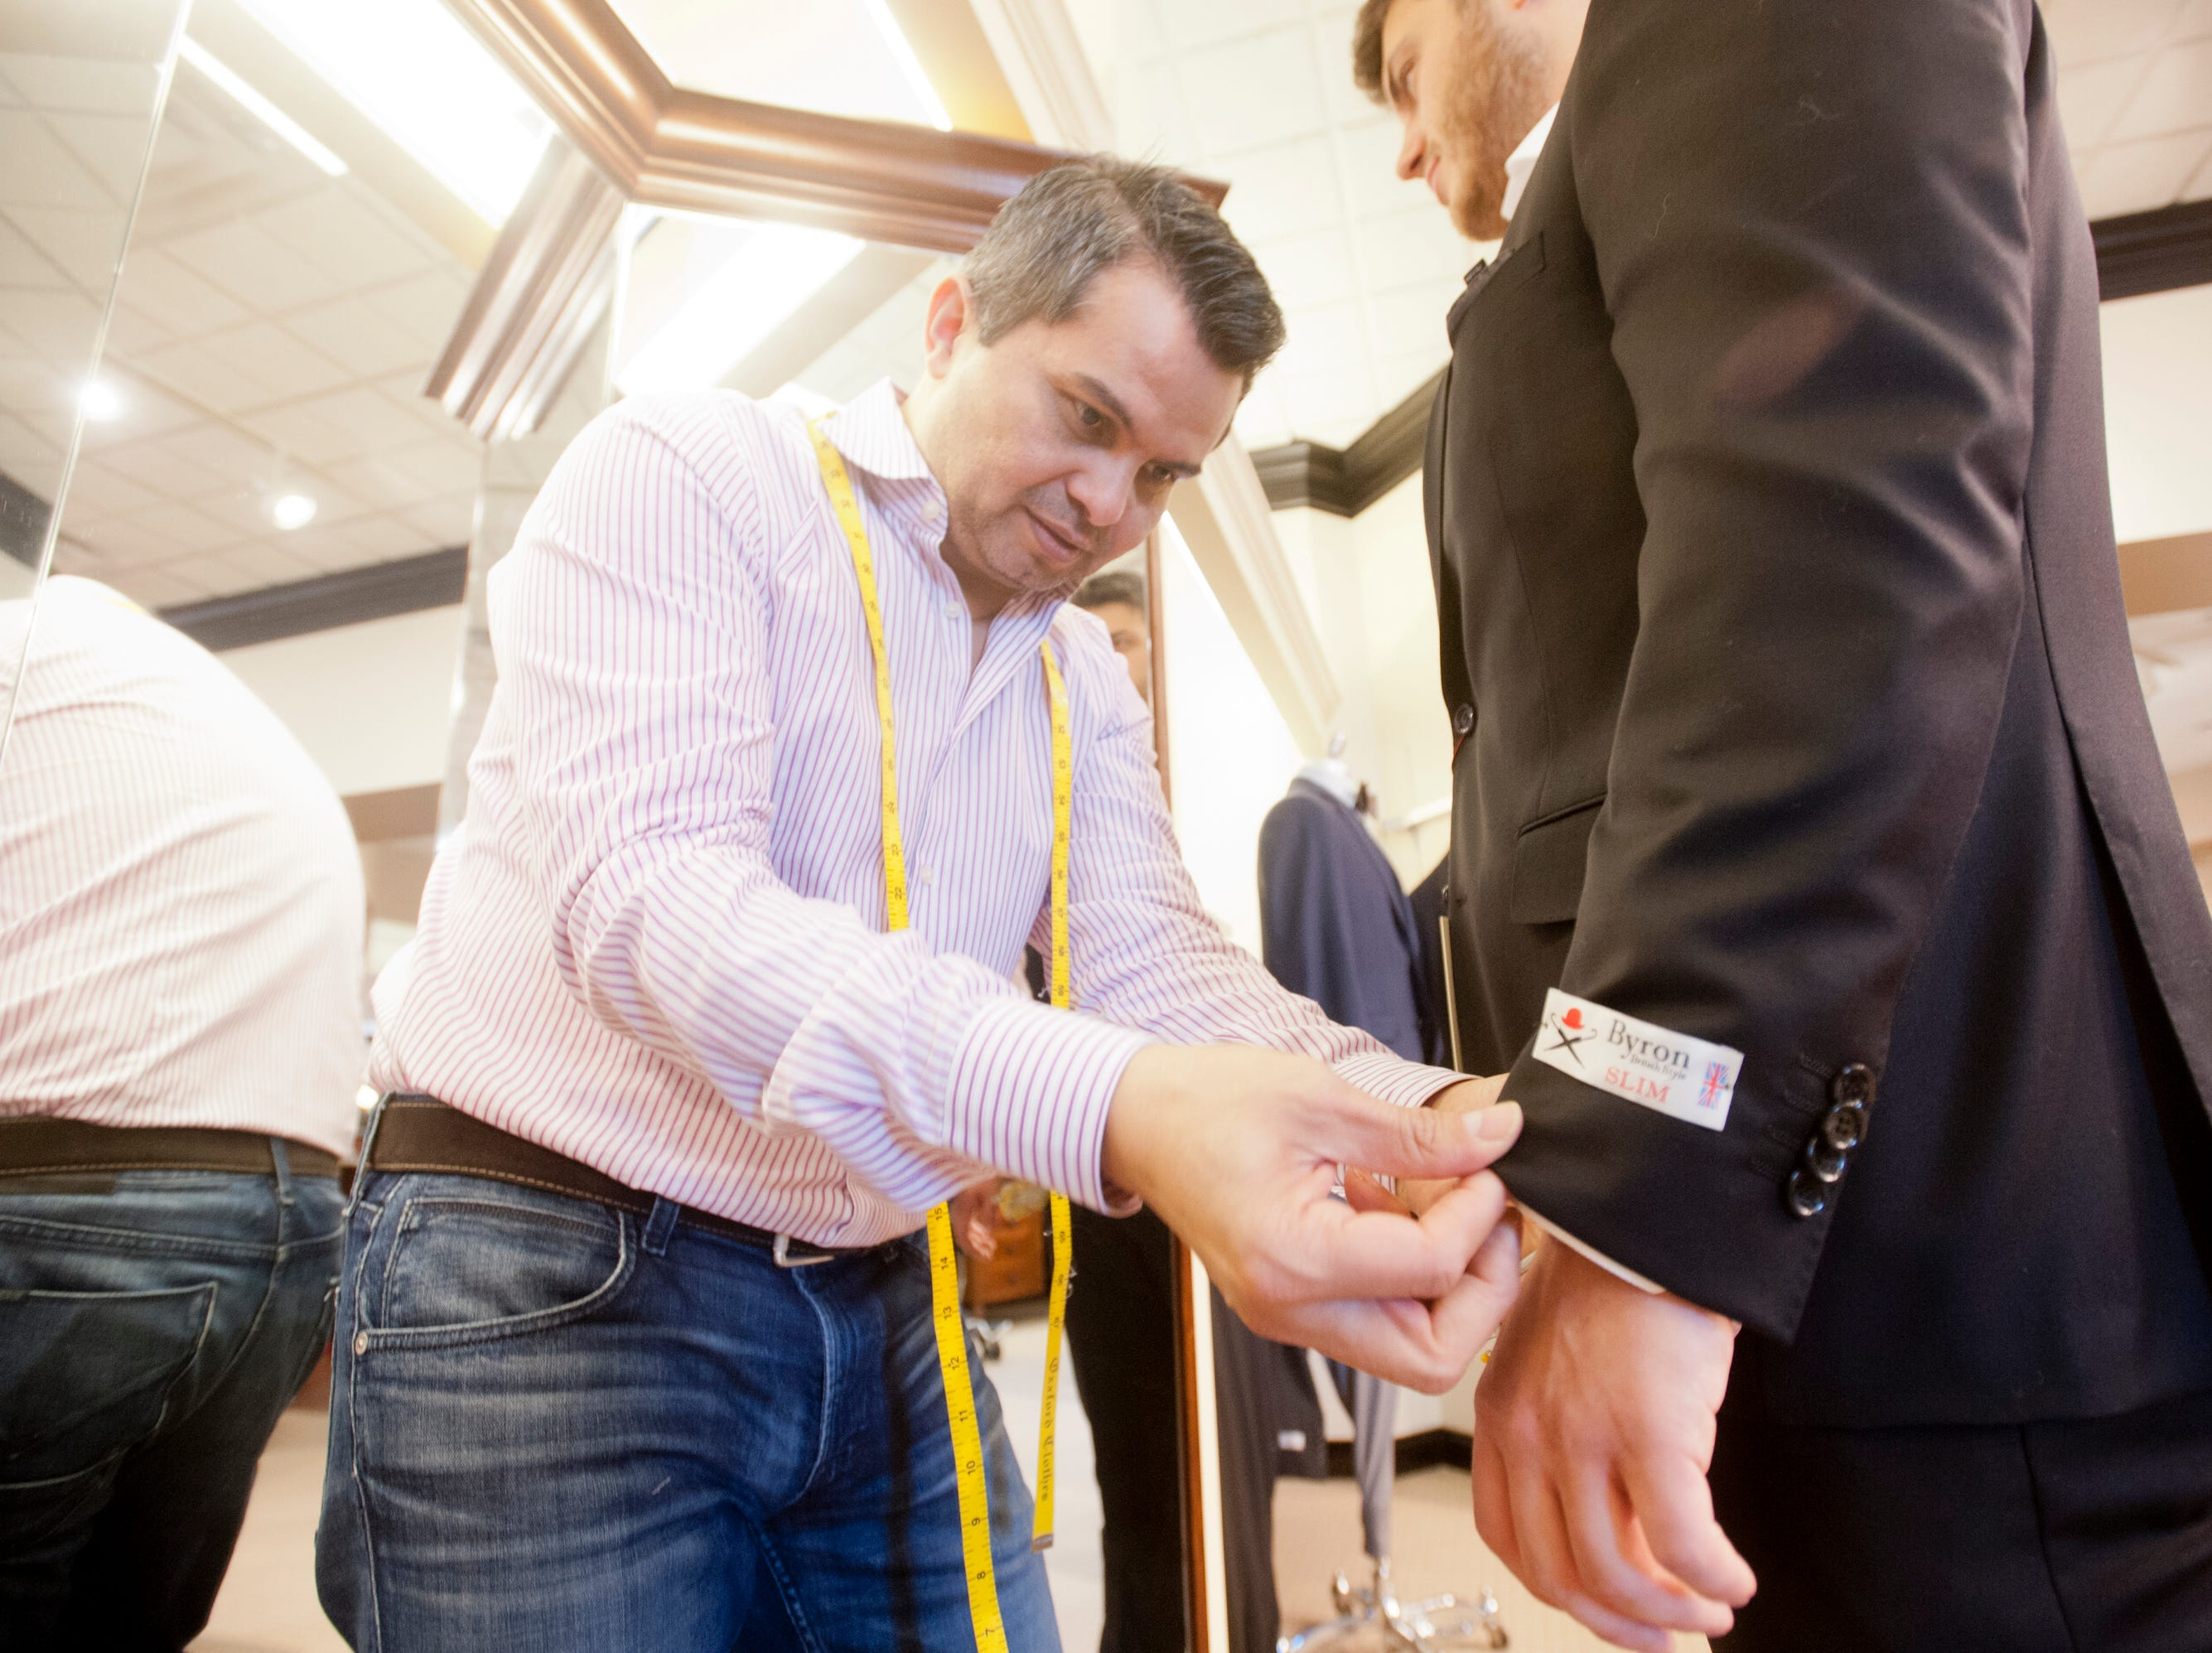 Rodes store tailor David Amaya fits Morgan Davis, of Sydney, Australia, for a suit.28 November 2018